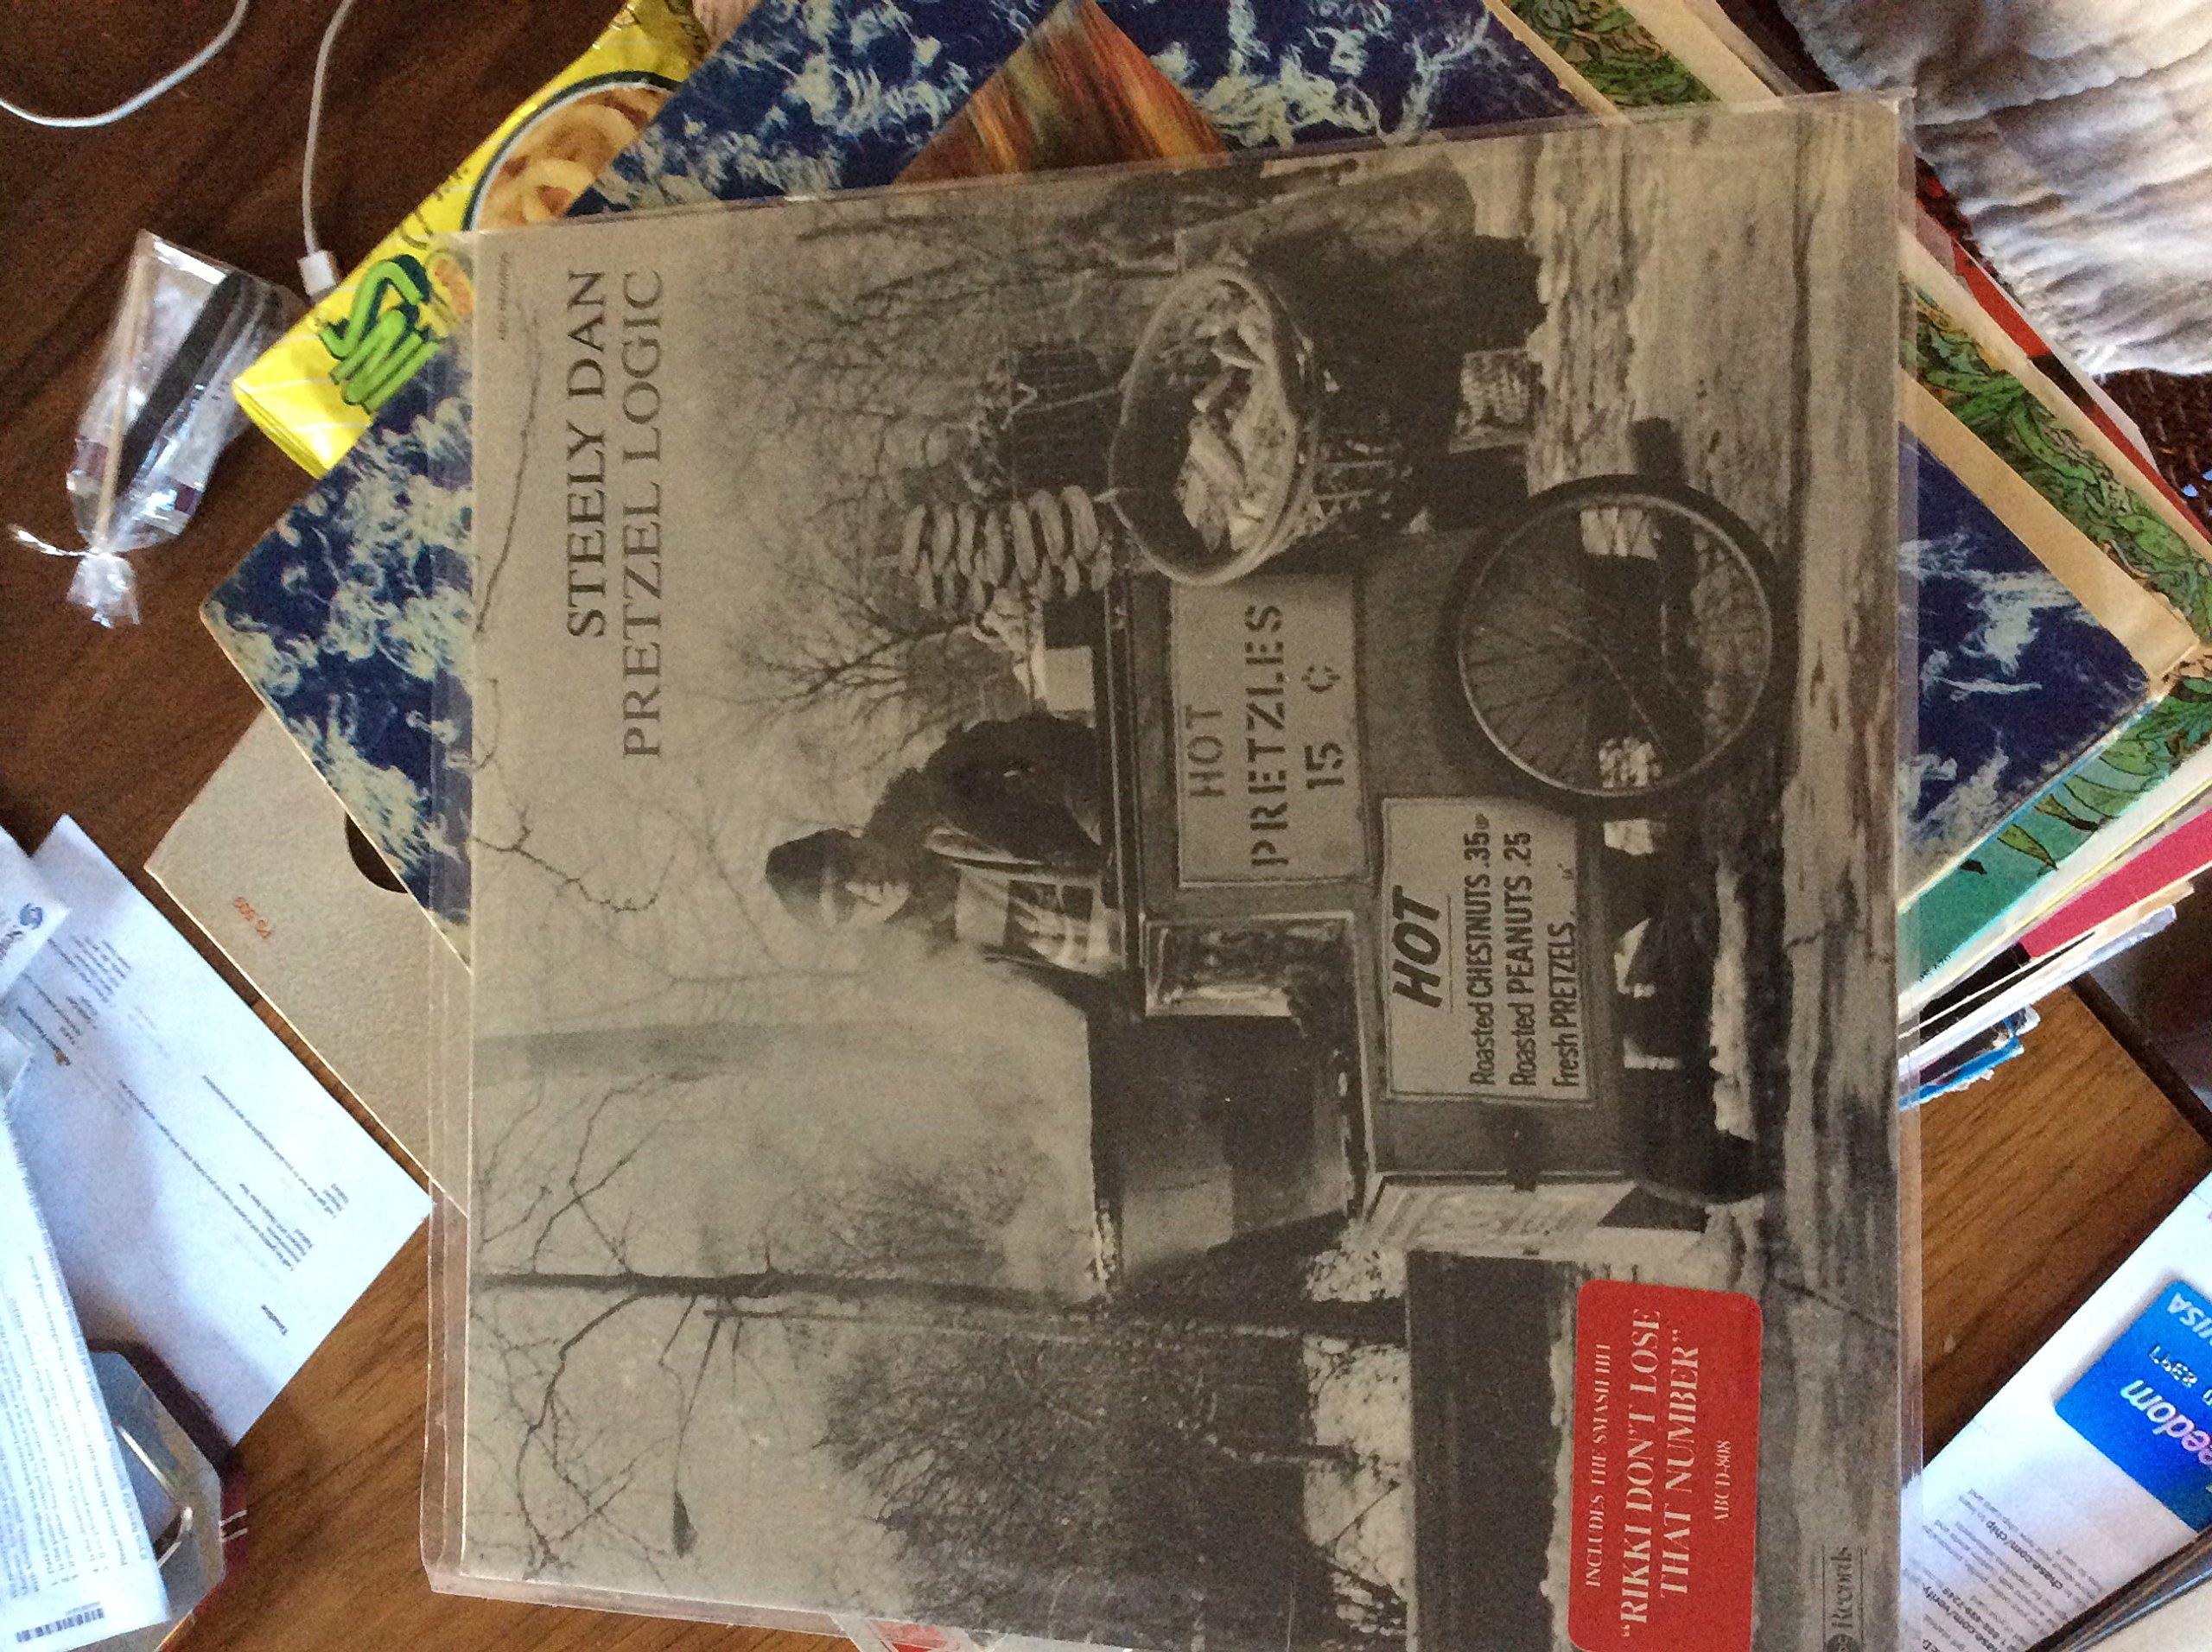 Pretzel Logic by ABC Records